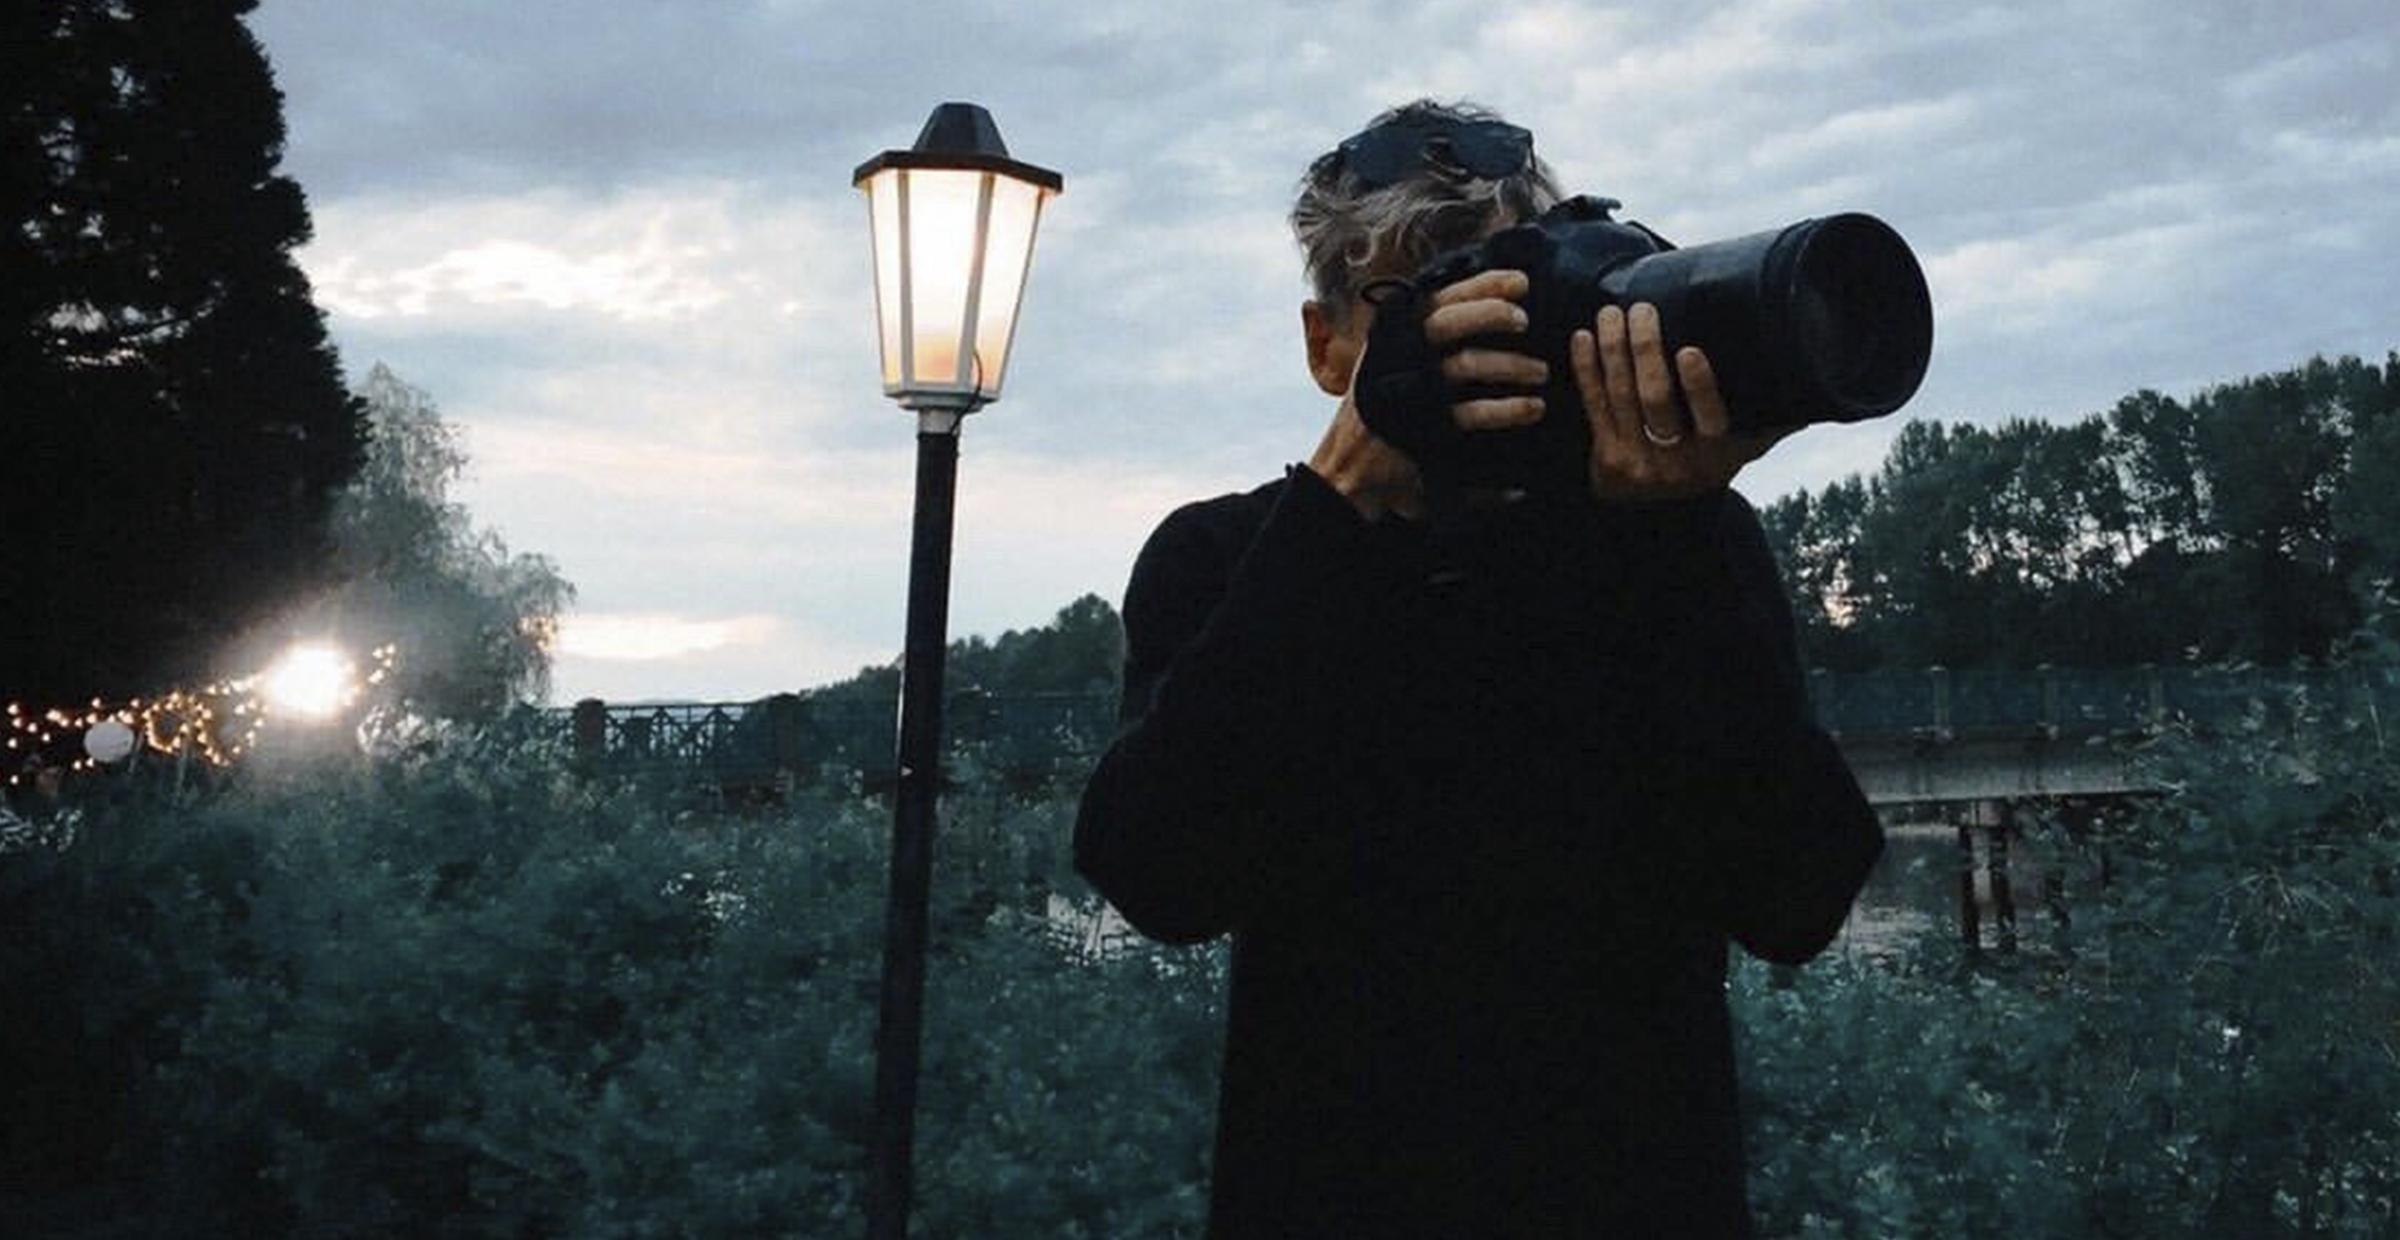 Ricardo Hubbs and his Camera